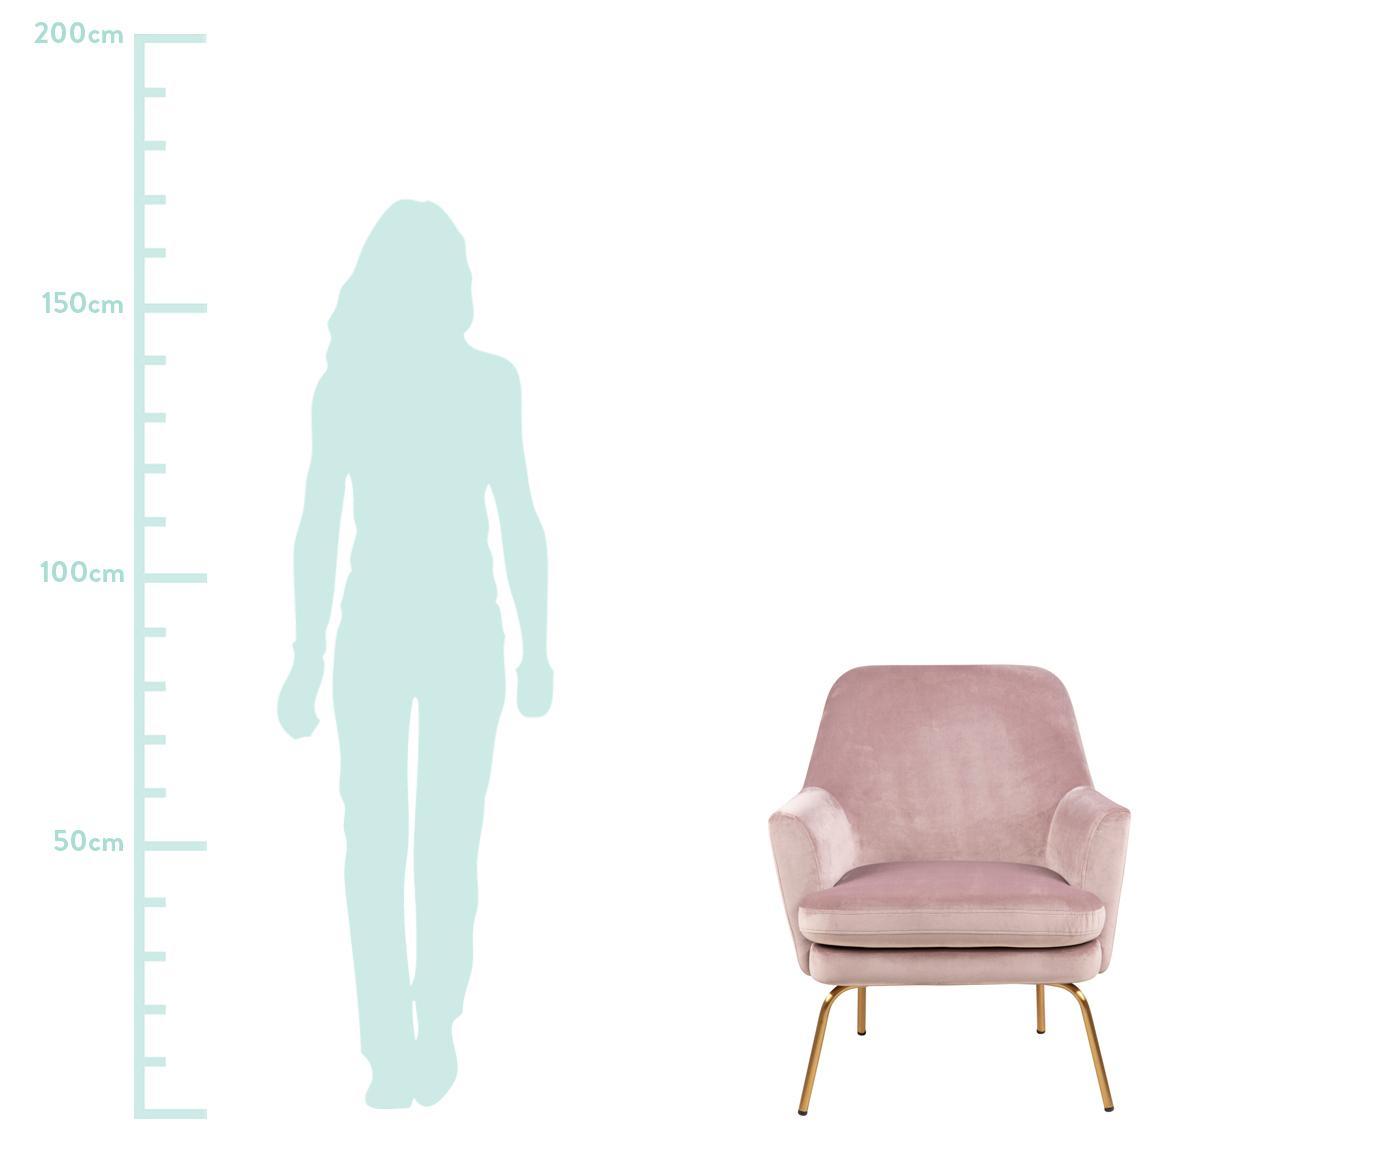 Samt-Loungesessel Chisa, Bezug: Polyestersamt 25.000 Sche, Beine: Metall, lackiert, Samt Rosa, B 68 x T 73 cm